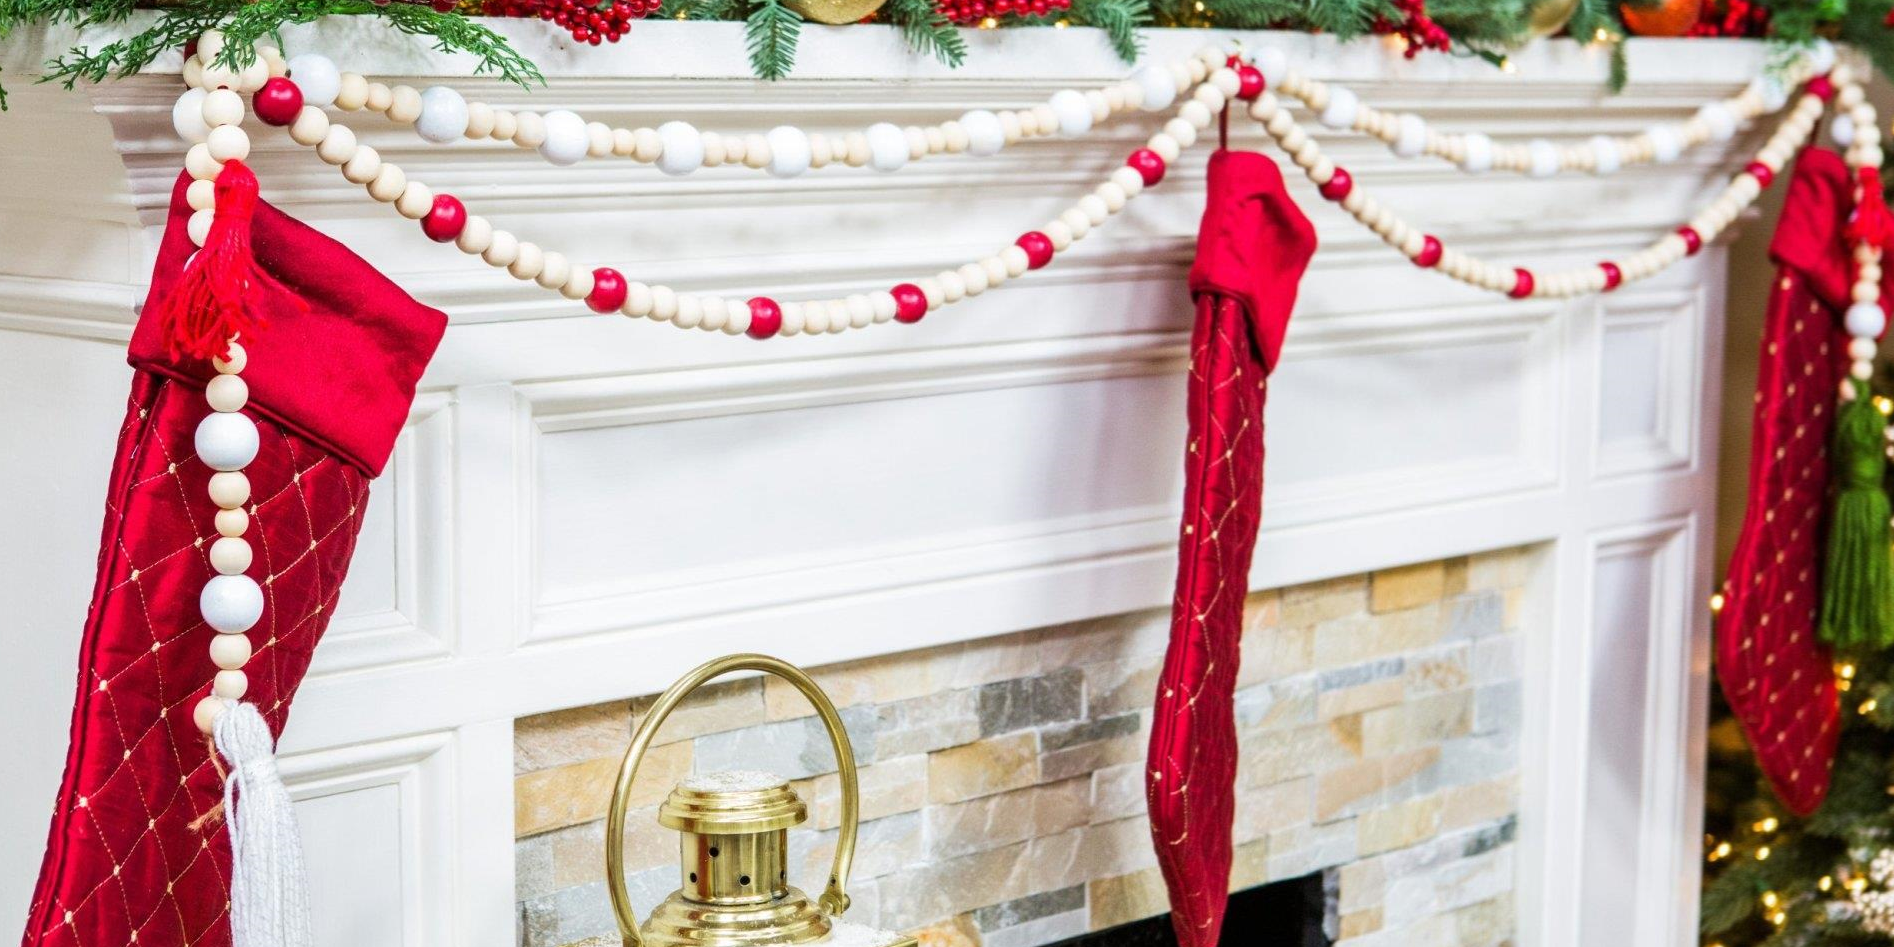 Christmas Garland on Hallmark Home & Family DIY Segment